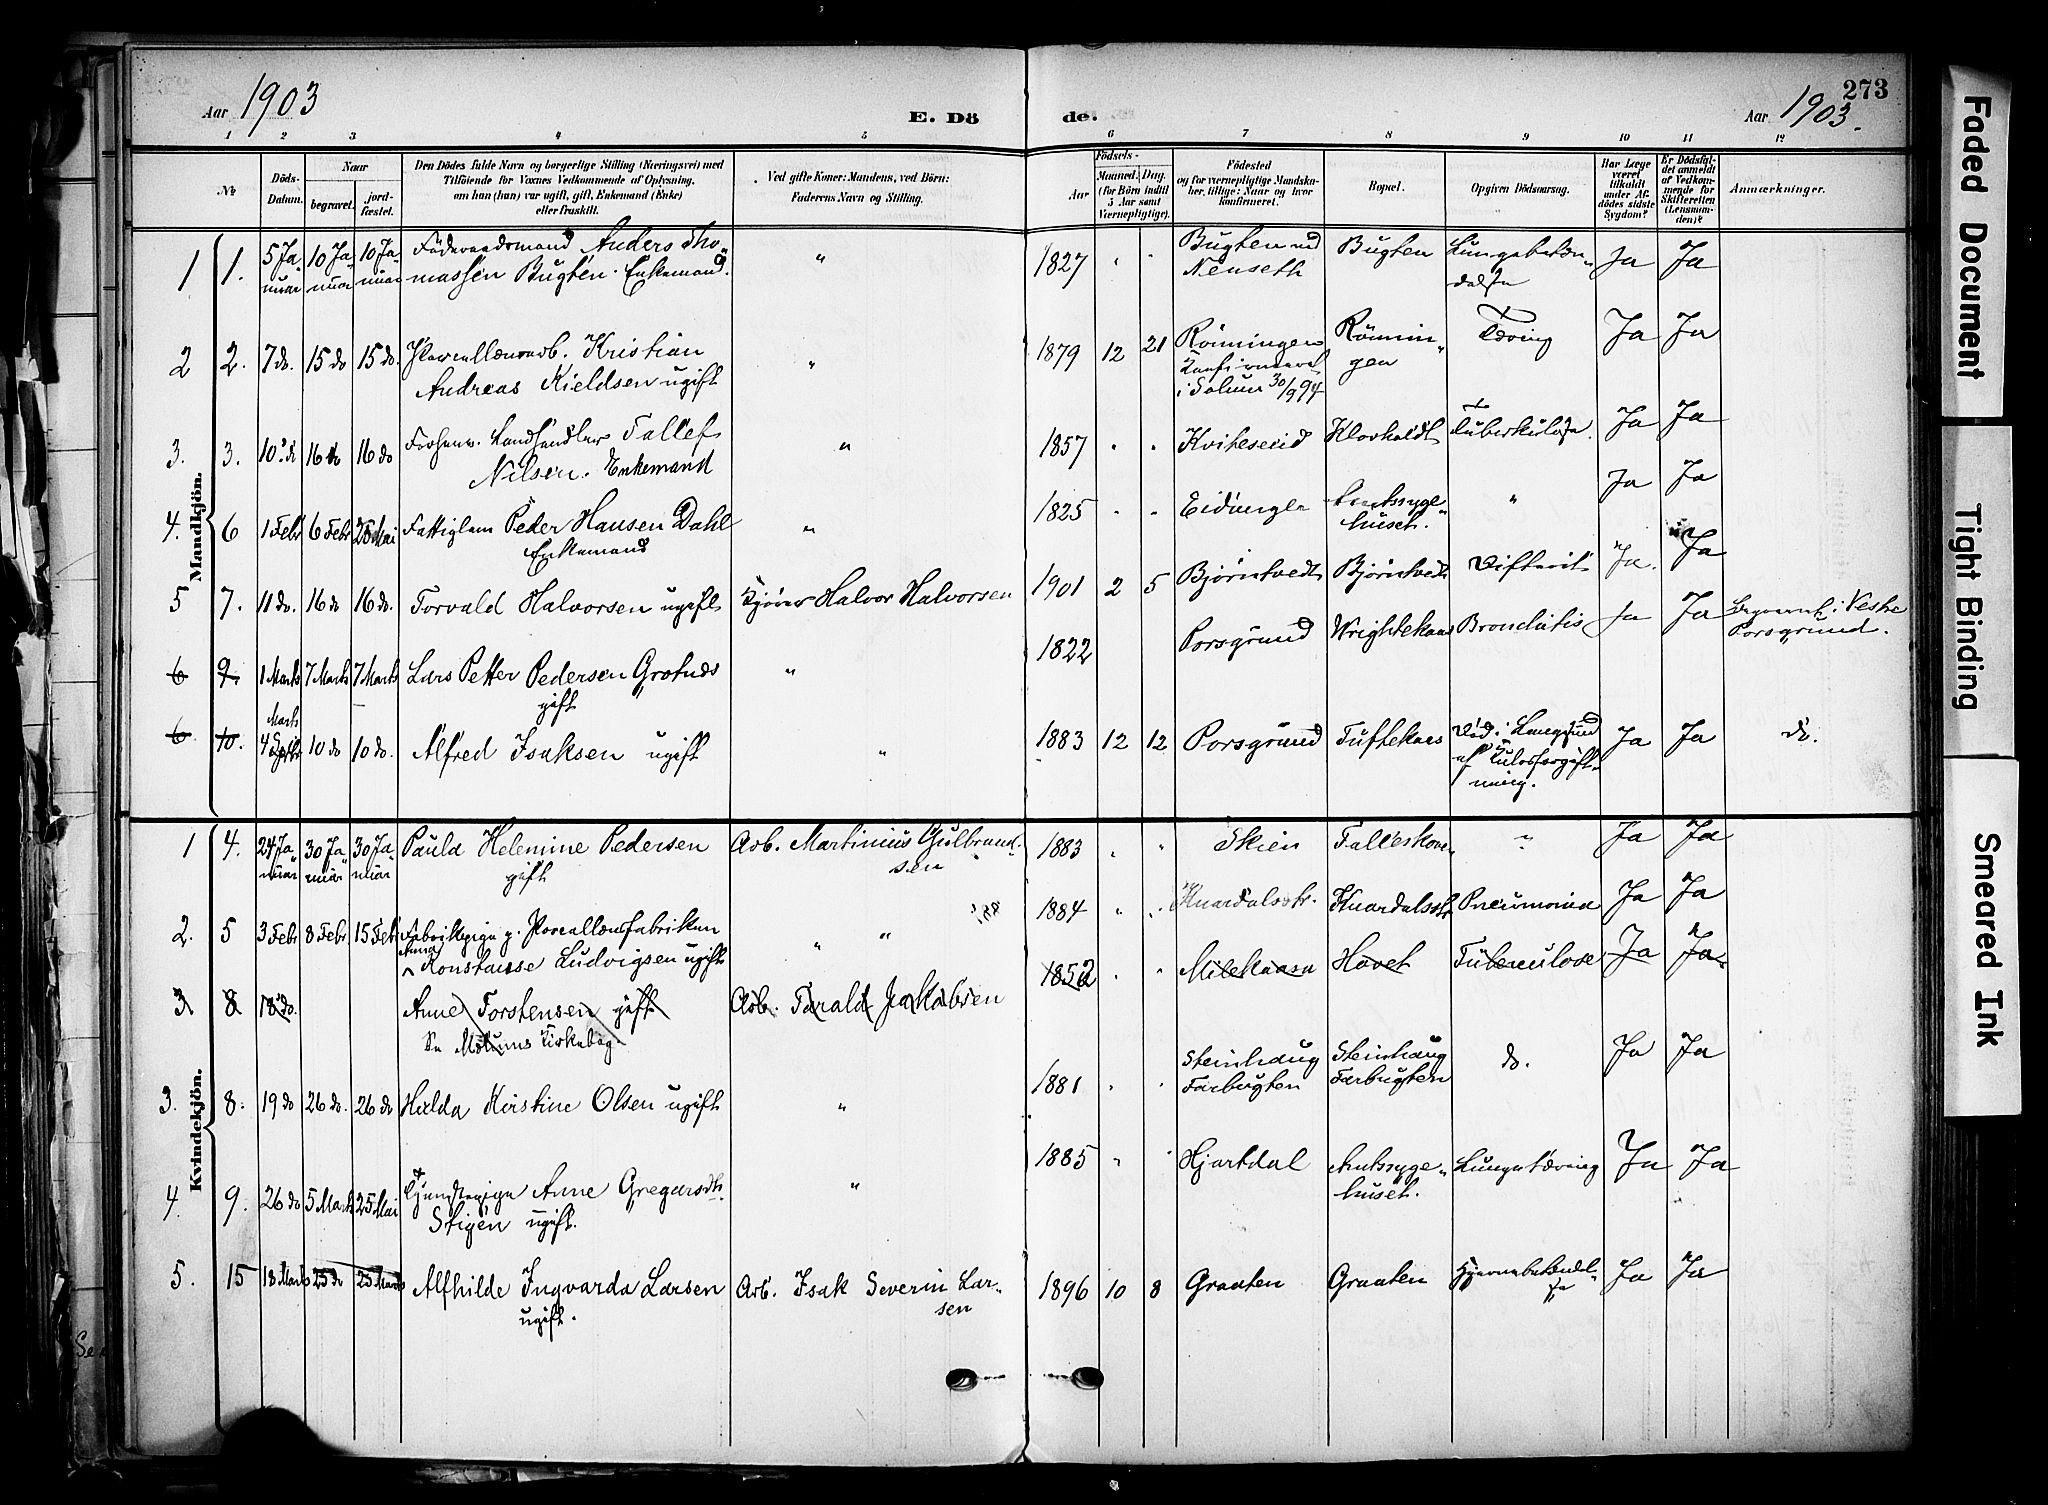 SAKO, Solum kirkebøker, F/Fa/L0011: Ministerialbok nr. I 11, 1898-1909, s. 273